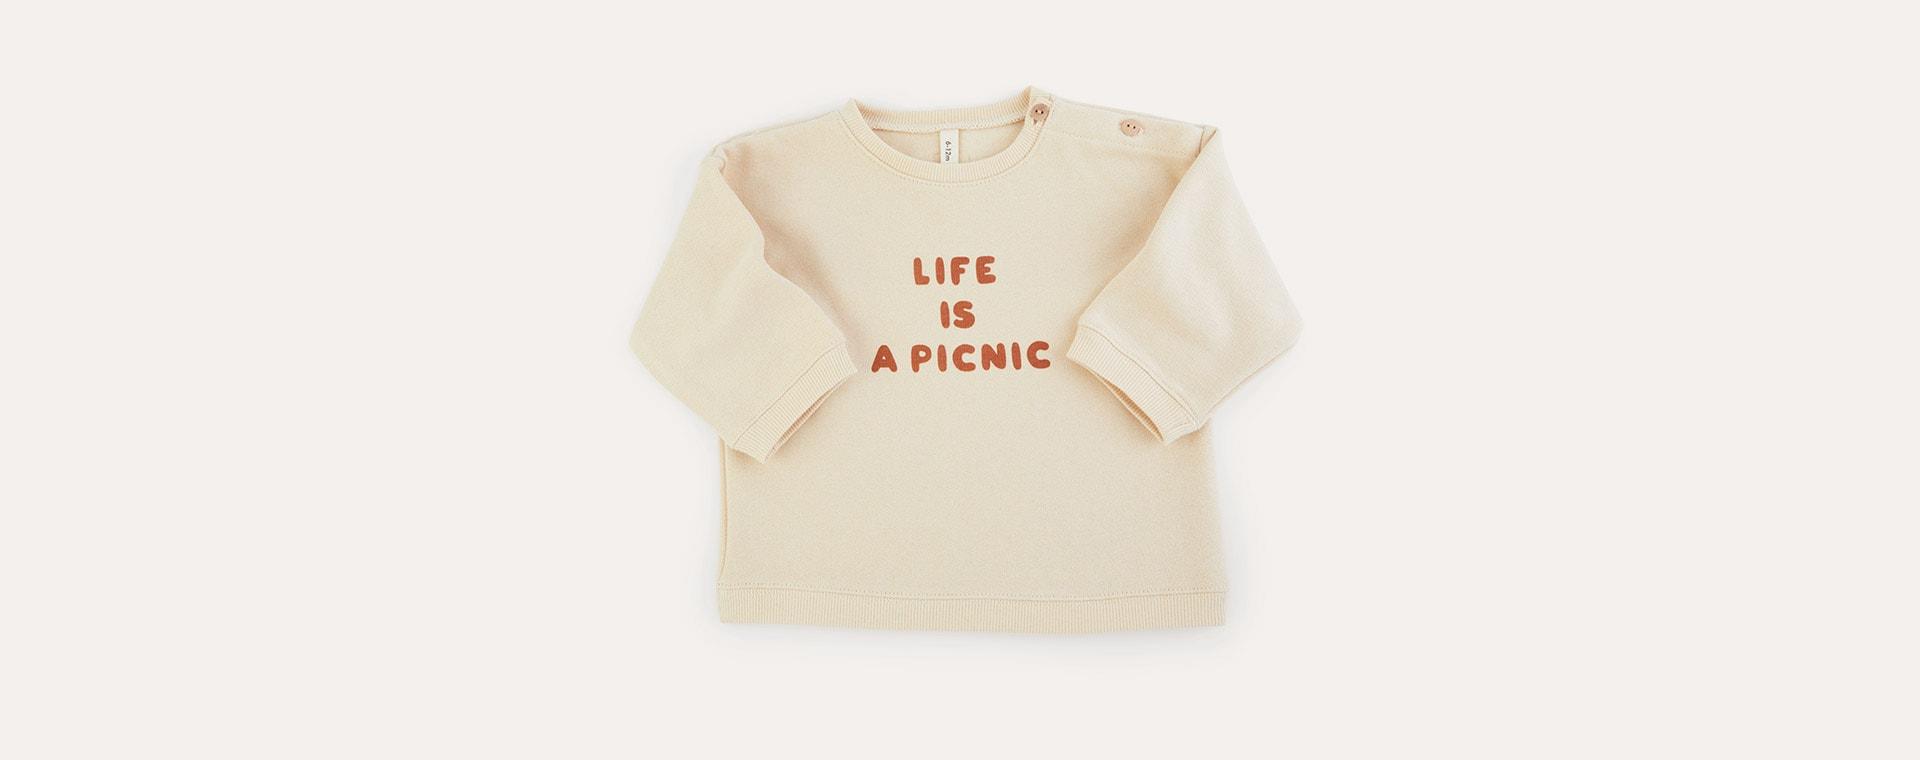 Life Is a Picnic Organic Zoo Sweatshirt